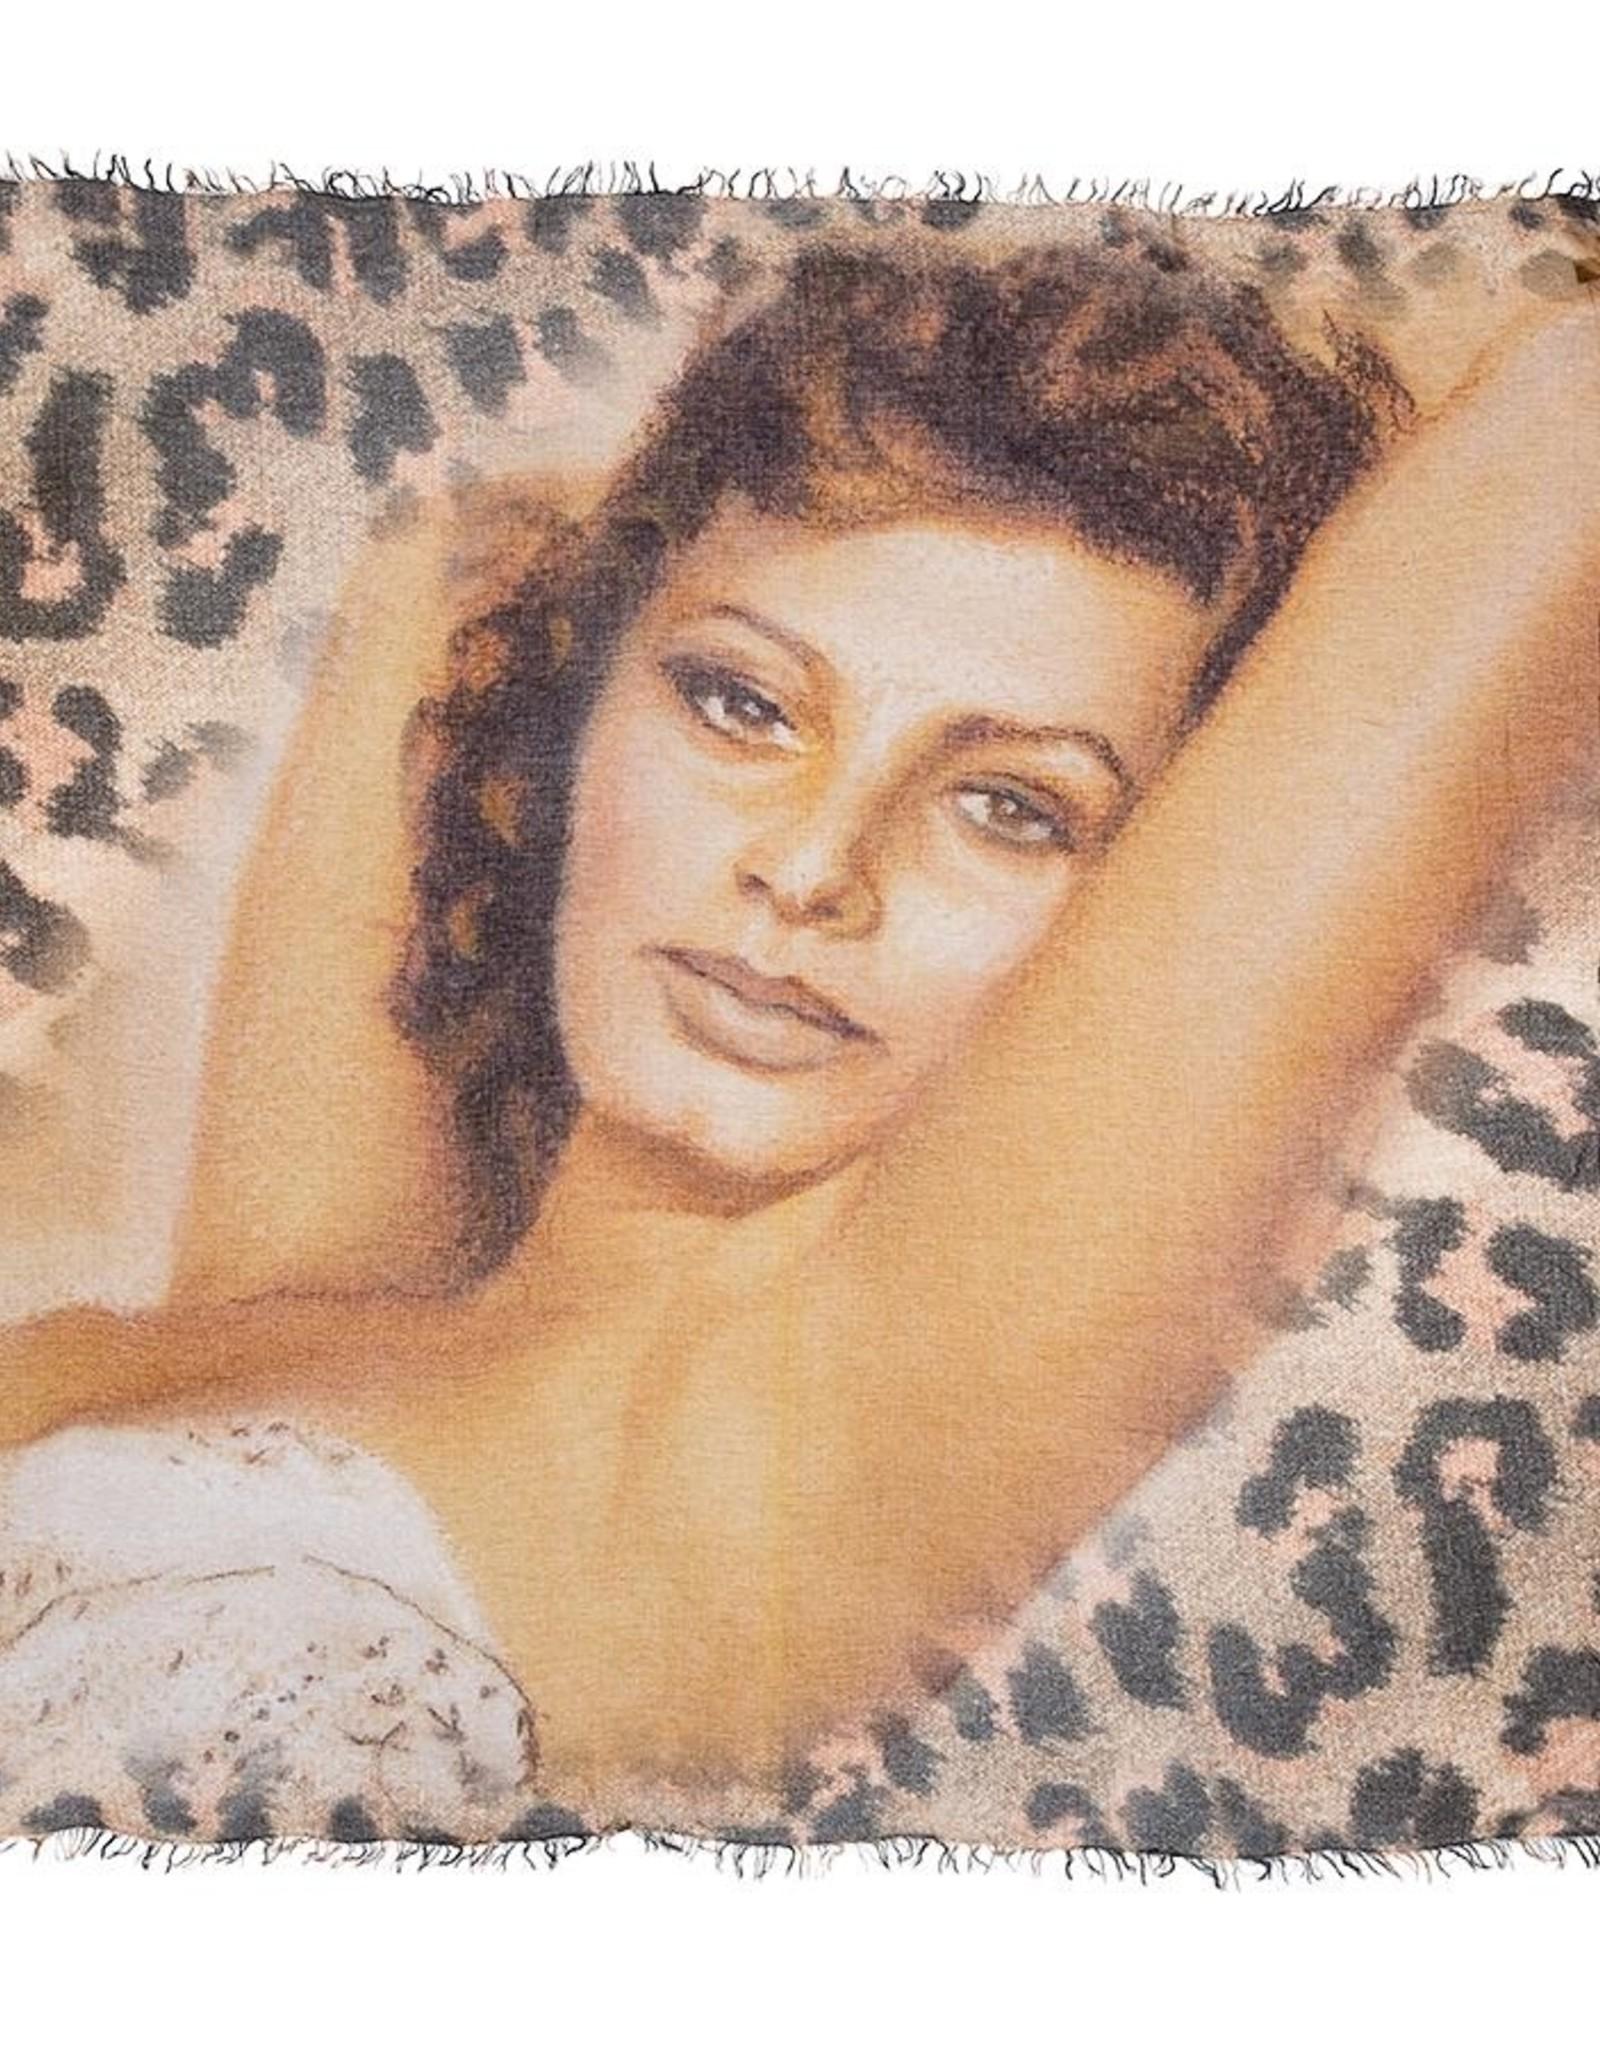 SUZI ROHER - Sophia Loren Scarf